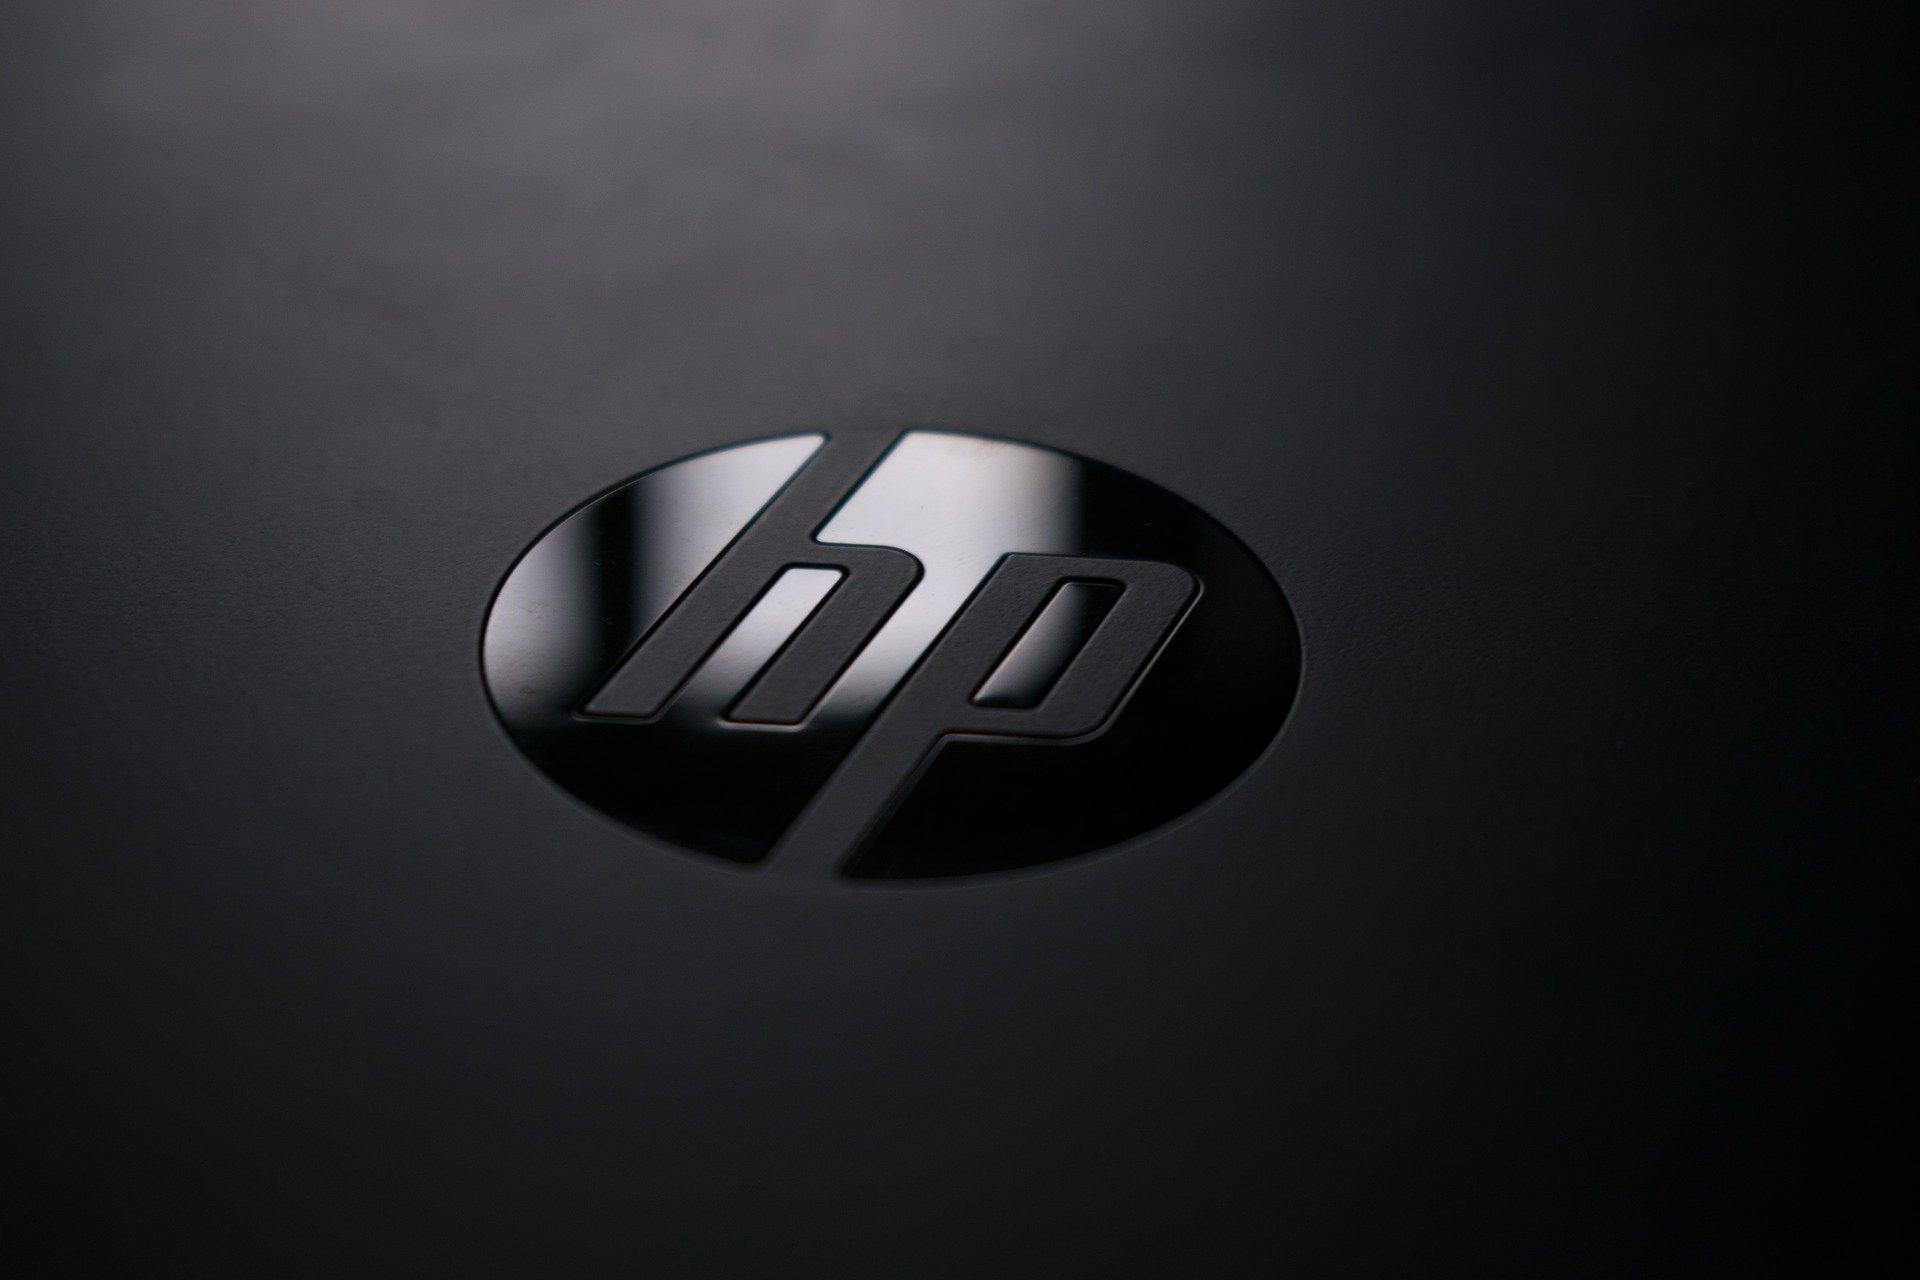 logo-2834458-1920-1